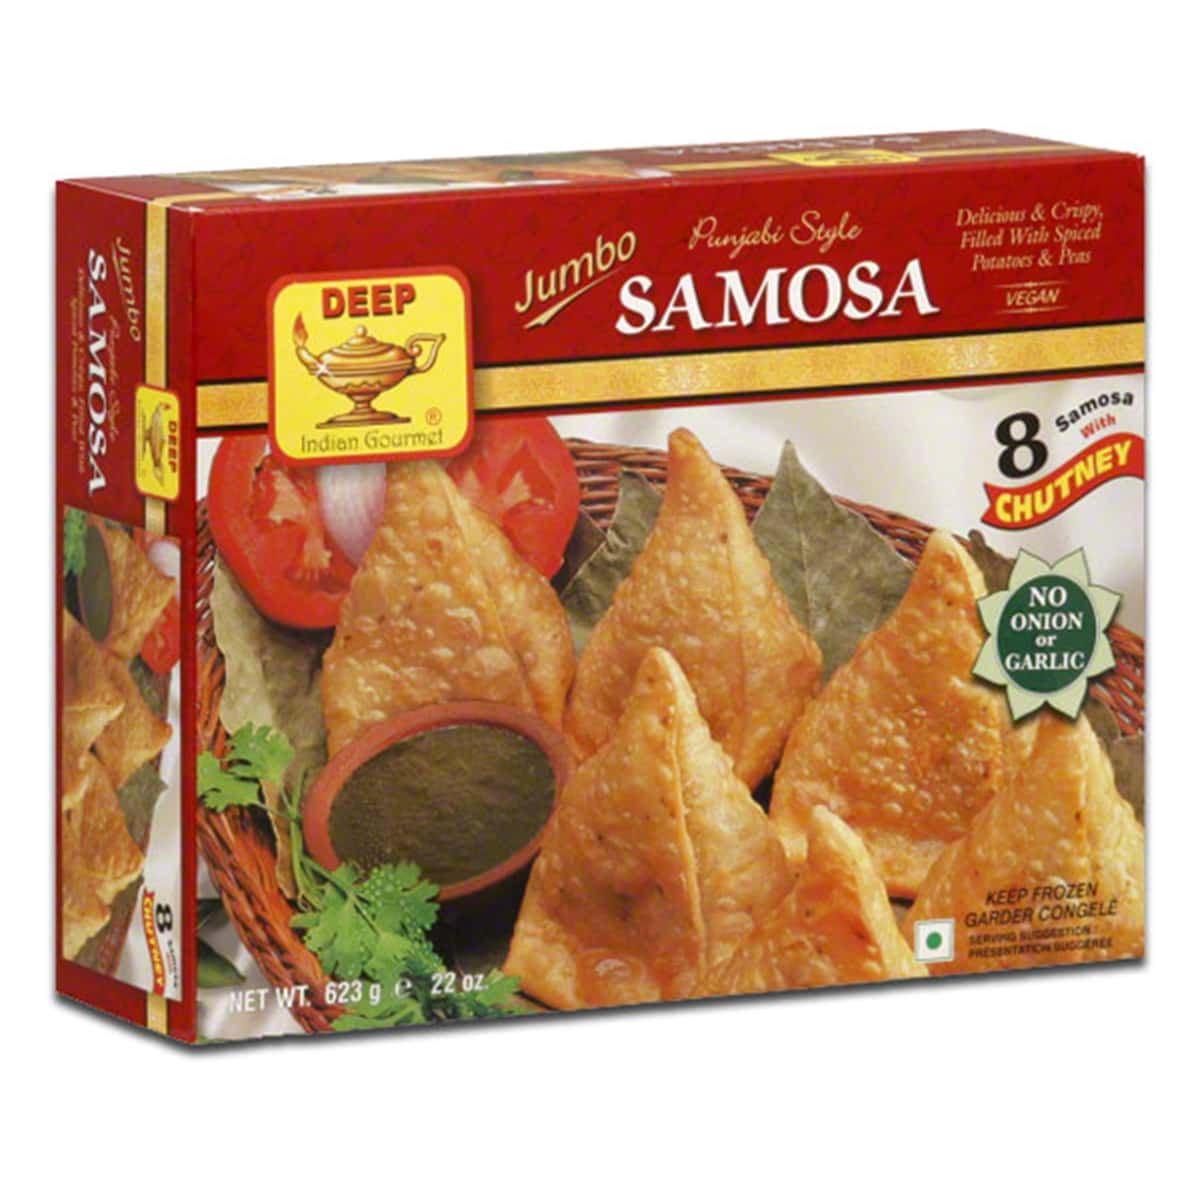 Buy Deep Foods Jumbo Punjabi Style Samosa with Chutney 8 Pcs (Frozen) - 623 gm